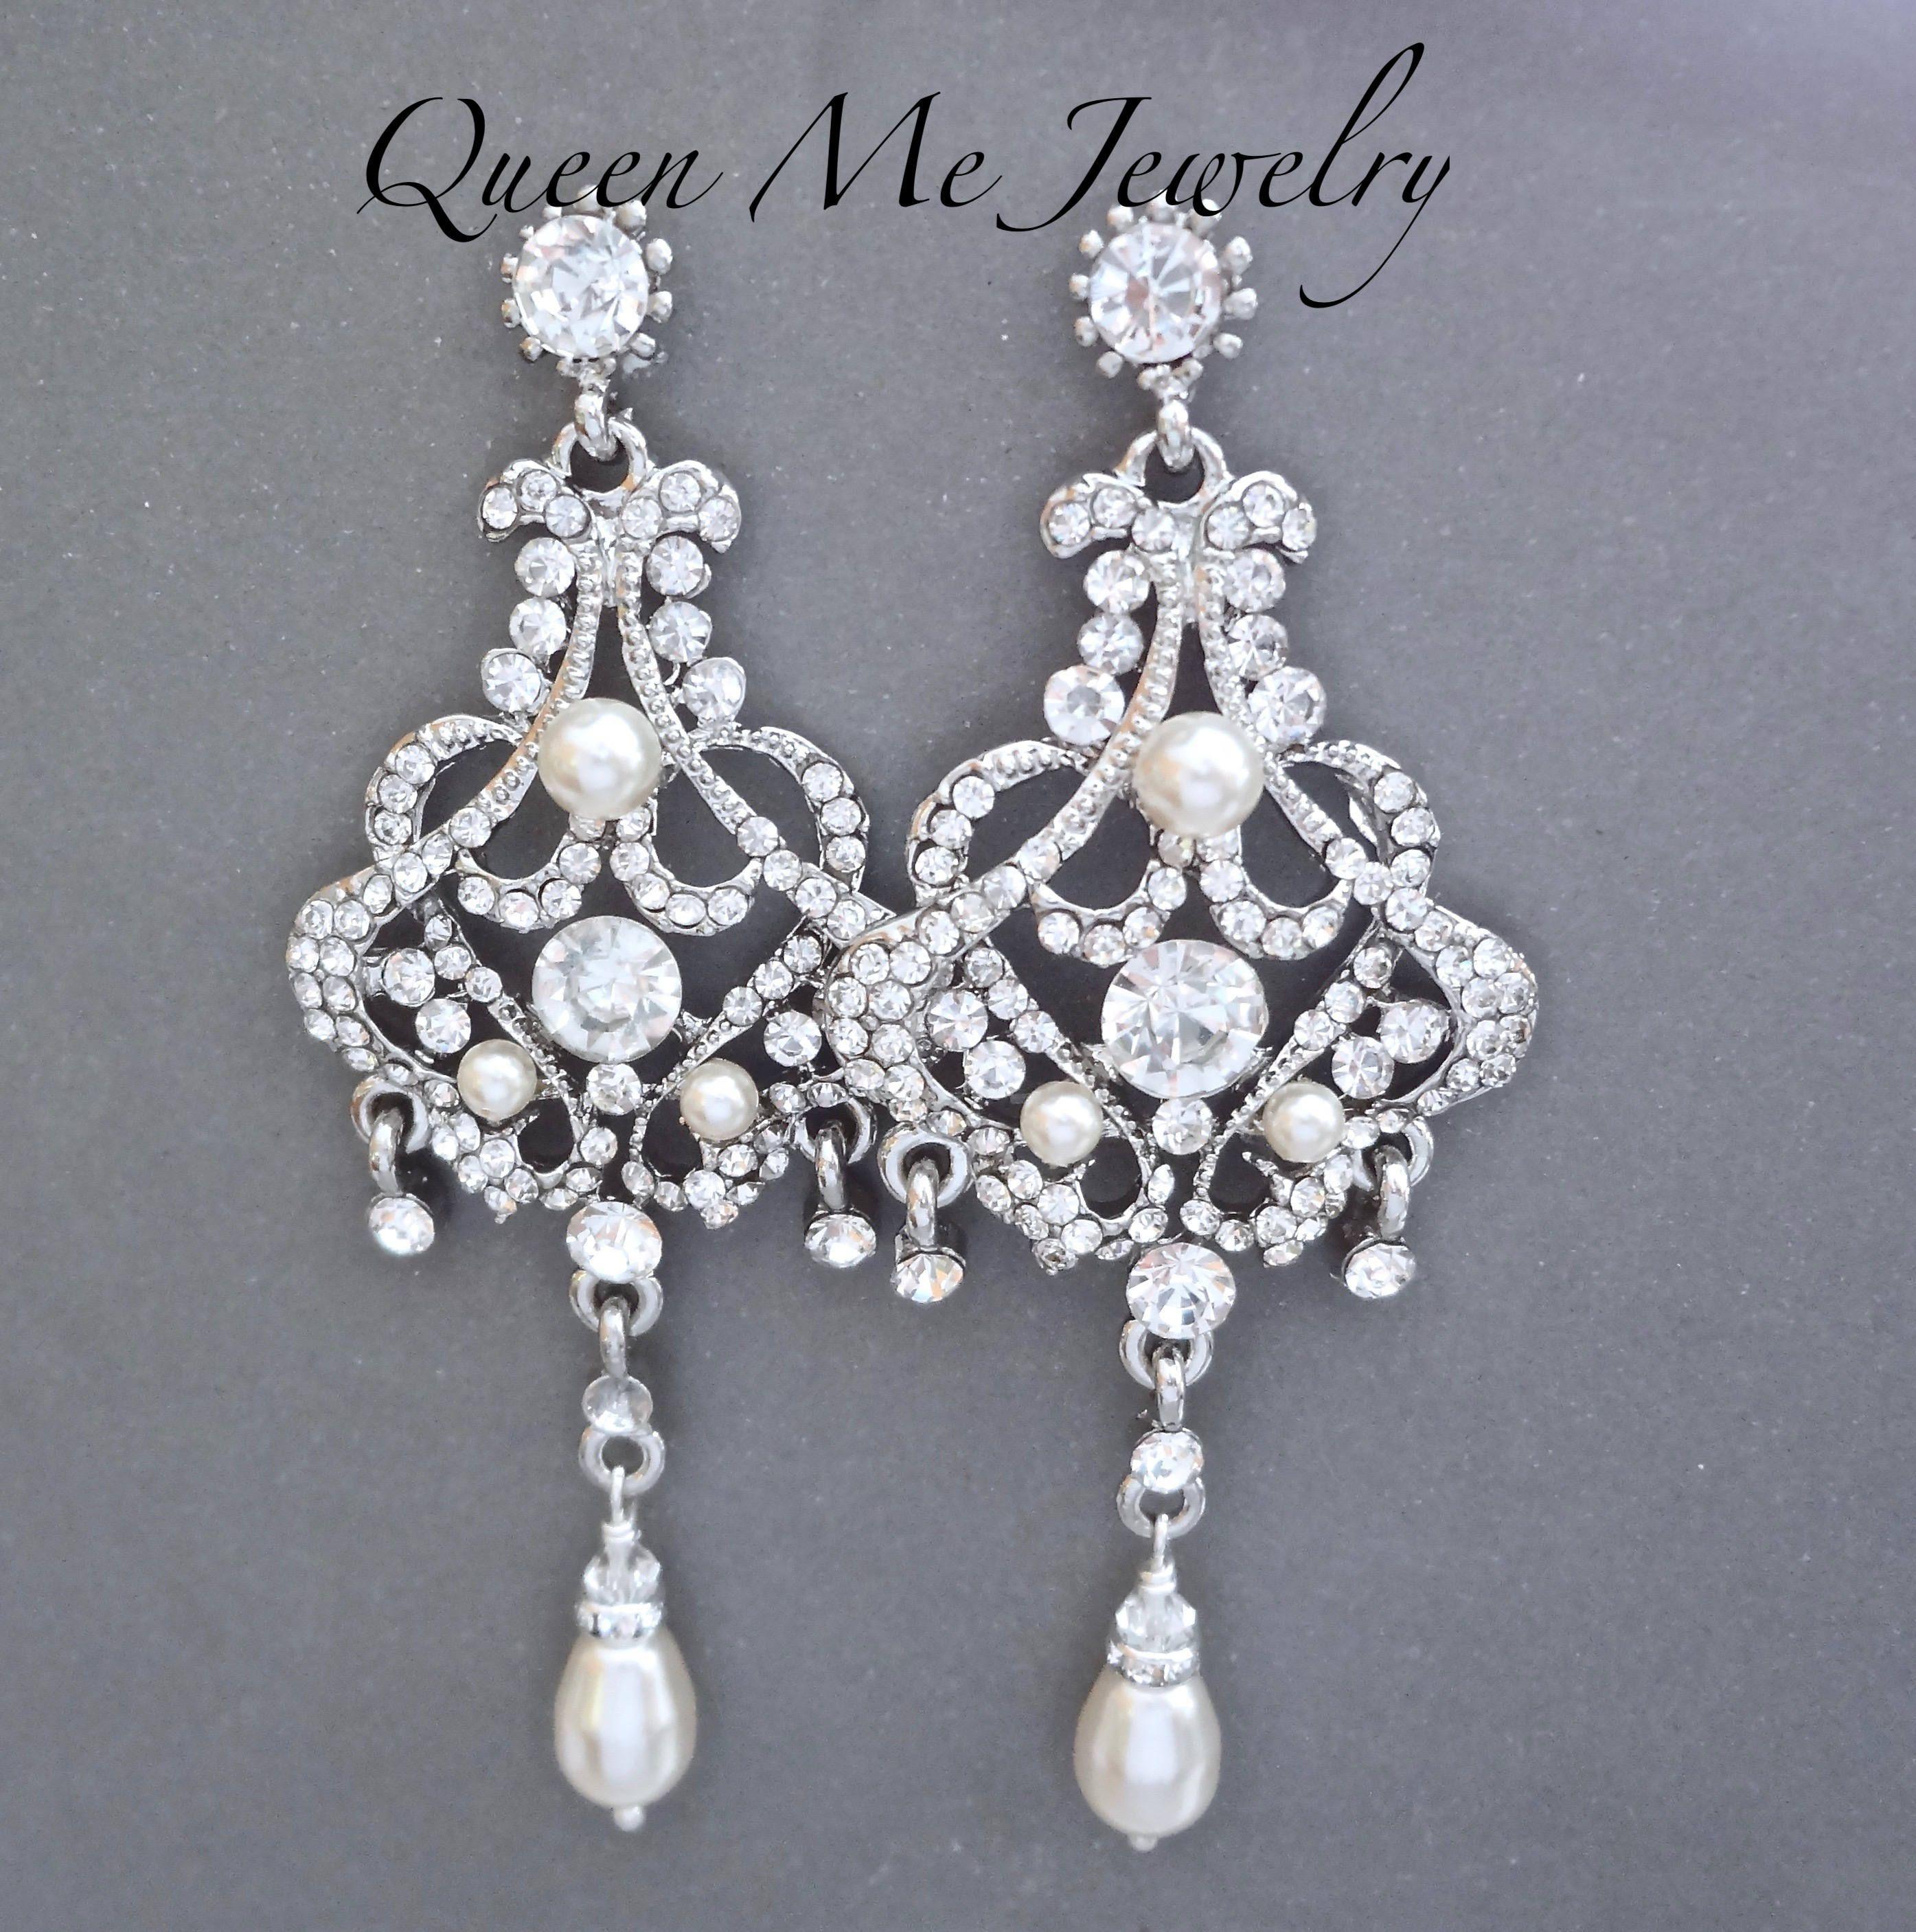 Long Chandelier Pearl Earrings Swarovski Pearls Crystal Couture